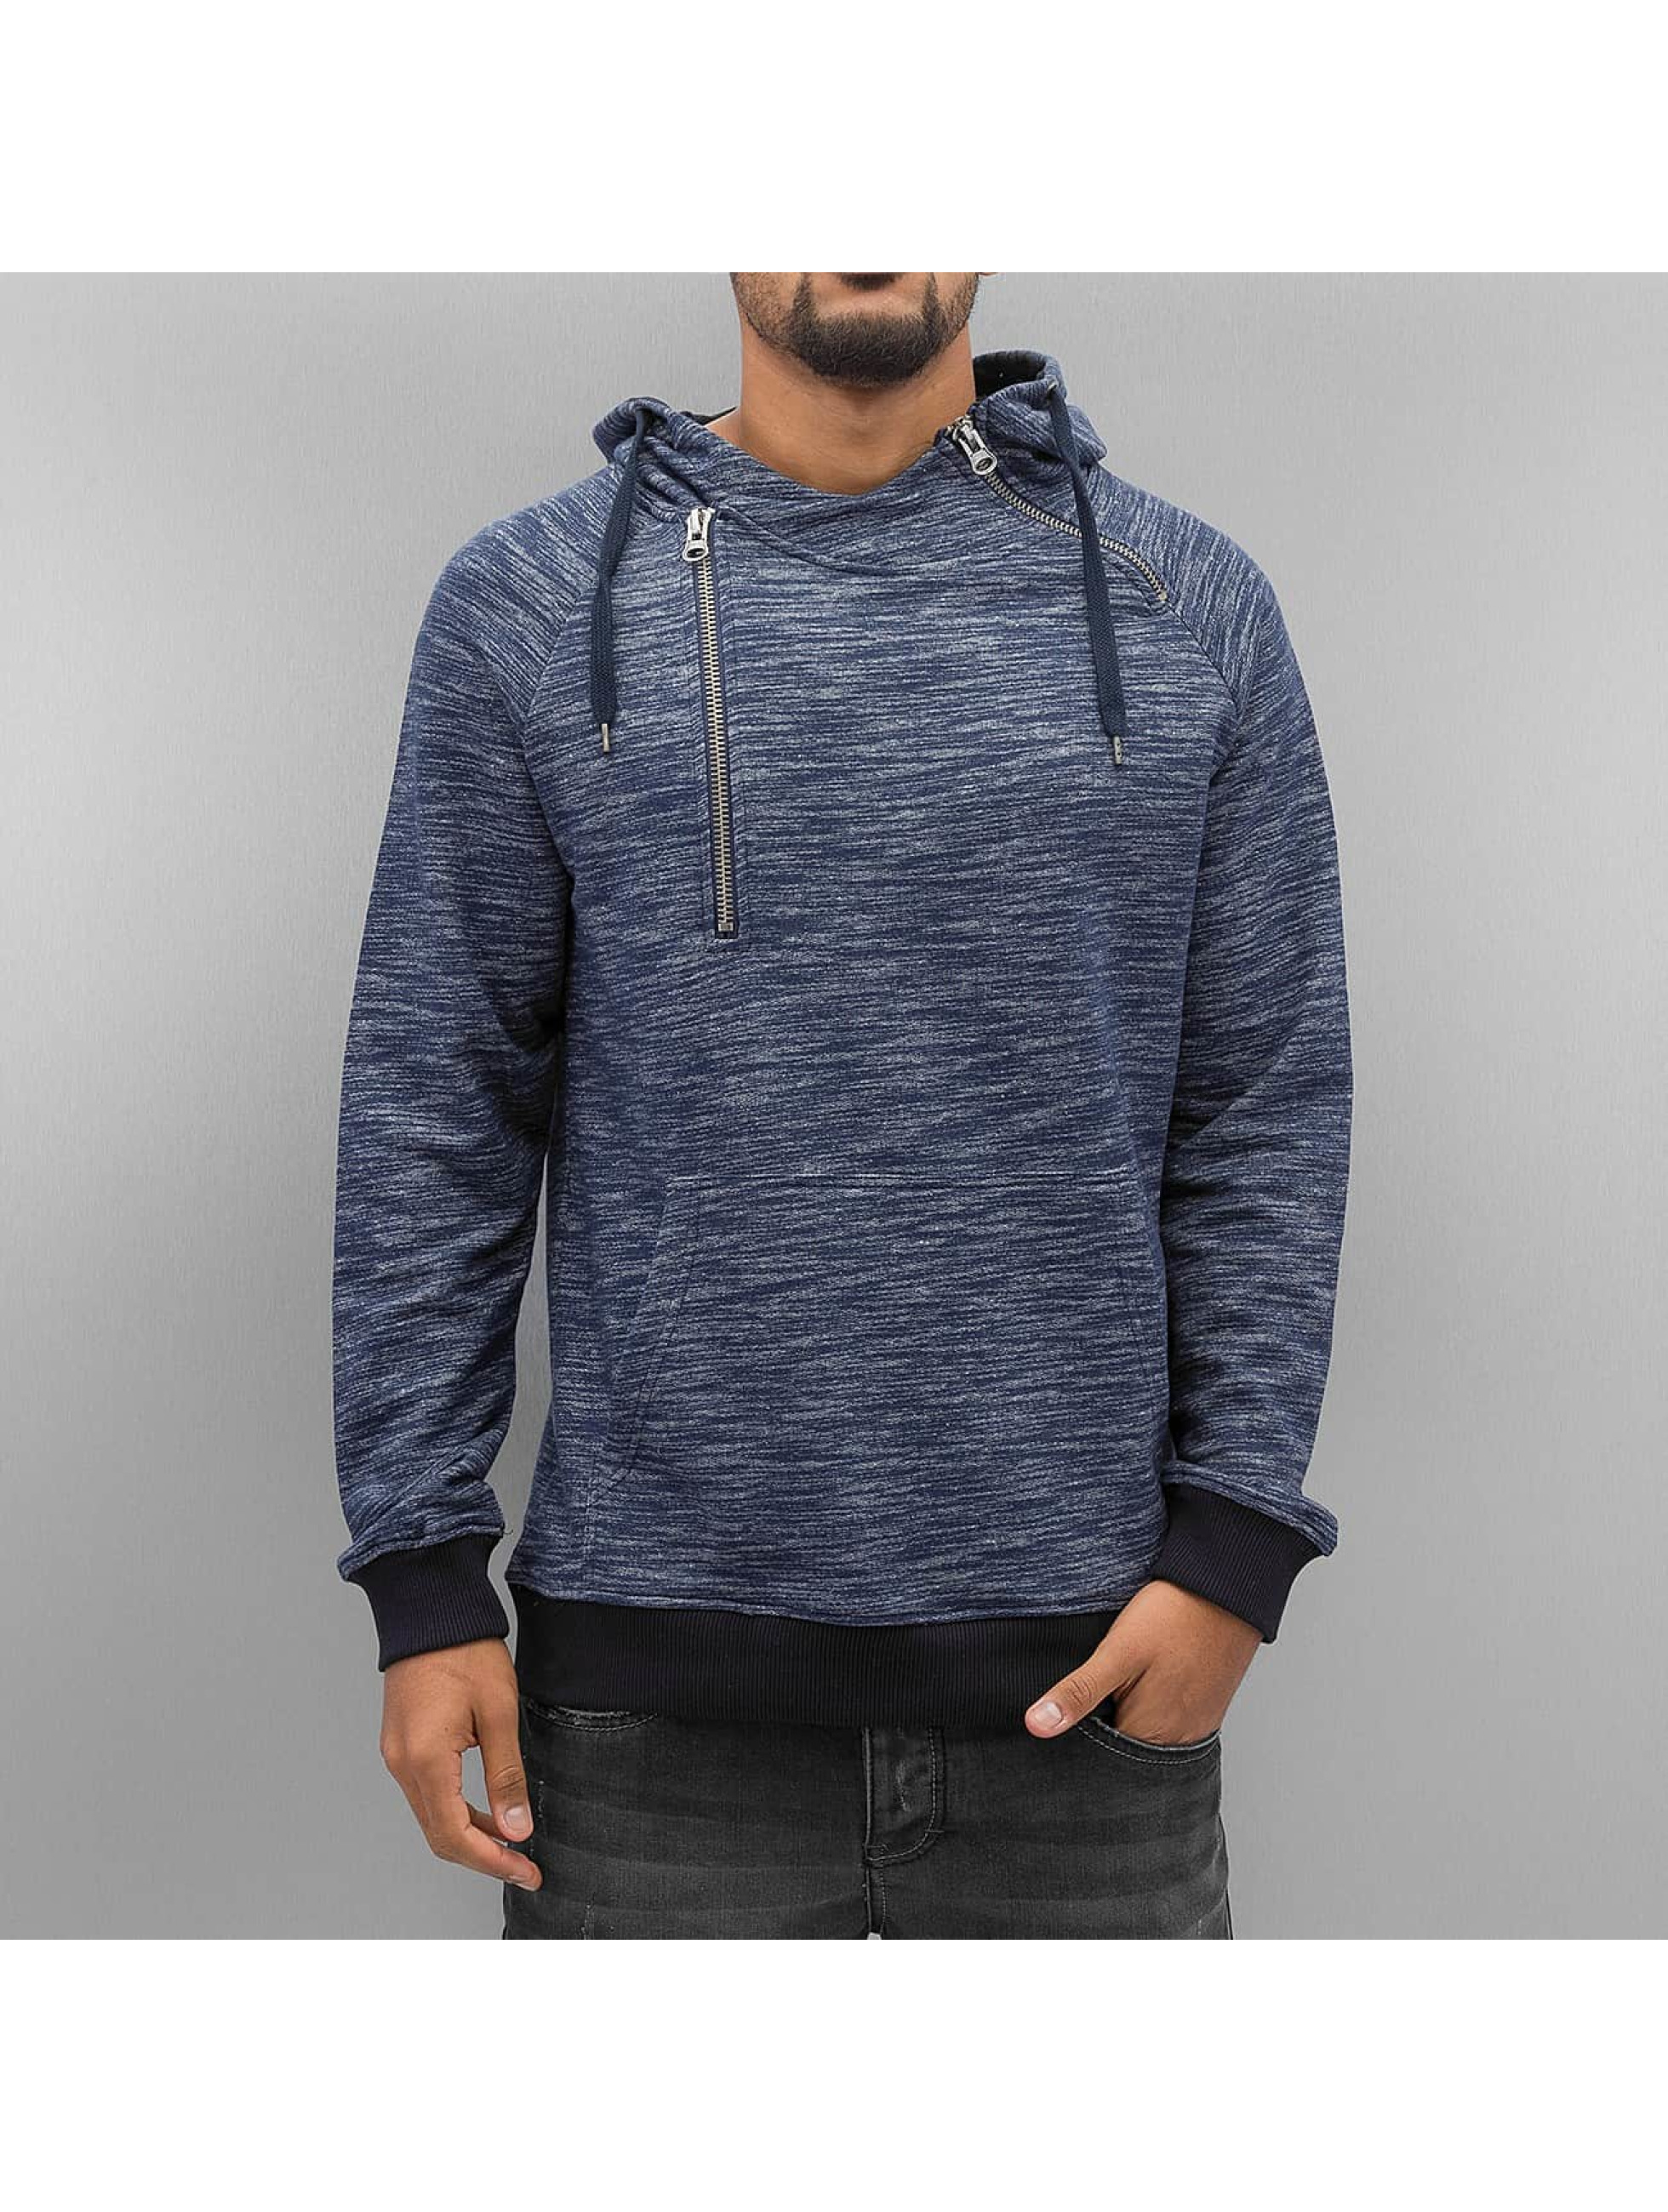 VSCT-Clubwear-Homme-Hauts-Sweat-a-capuche-Shiro-2-Zip-Moulinee-Kangool